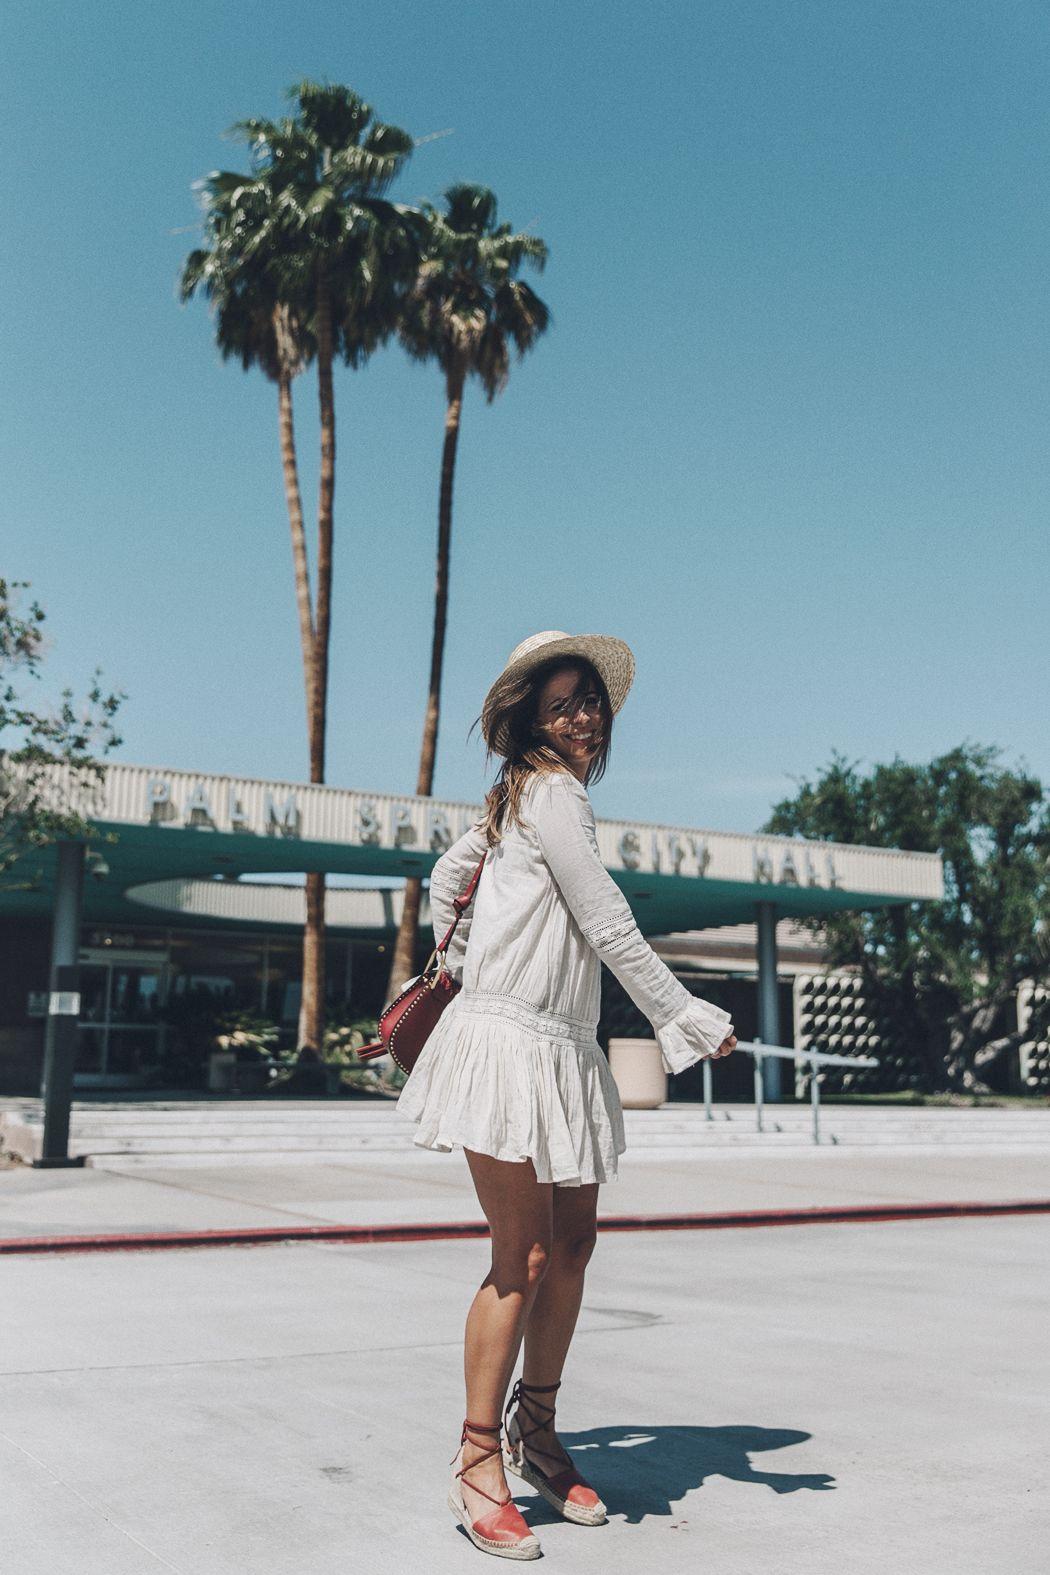 Coachella_2016-Revolve_Clothing-Tula_Rosa_Dress-Boho_Dress-Festival_Outfit-Straw_Hat-Soludos_Espadrilles-Collage_Vintage-19